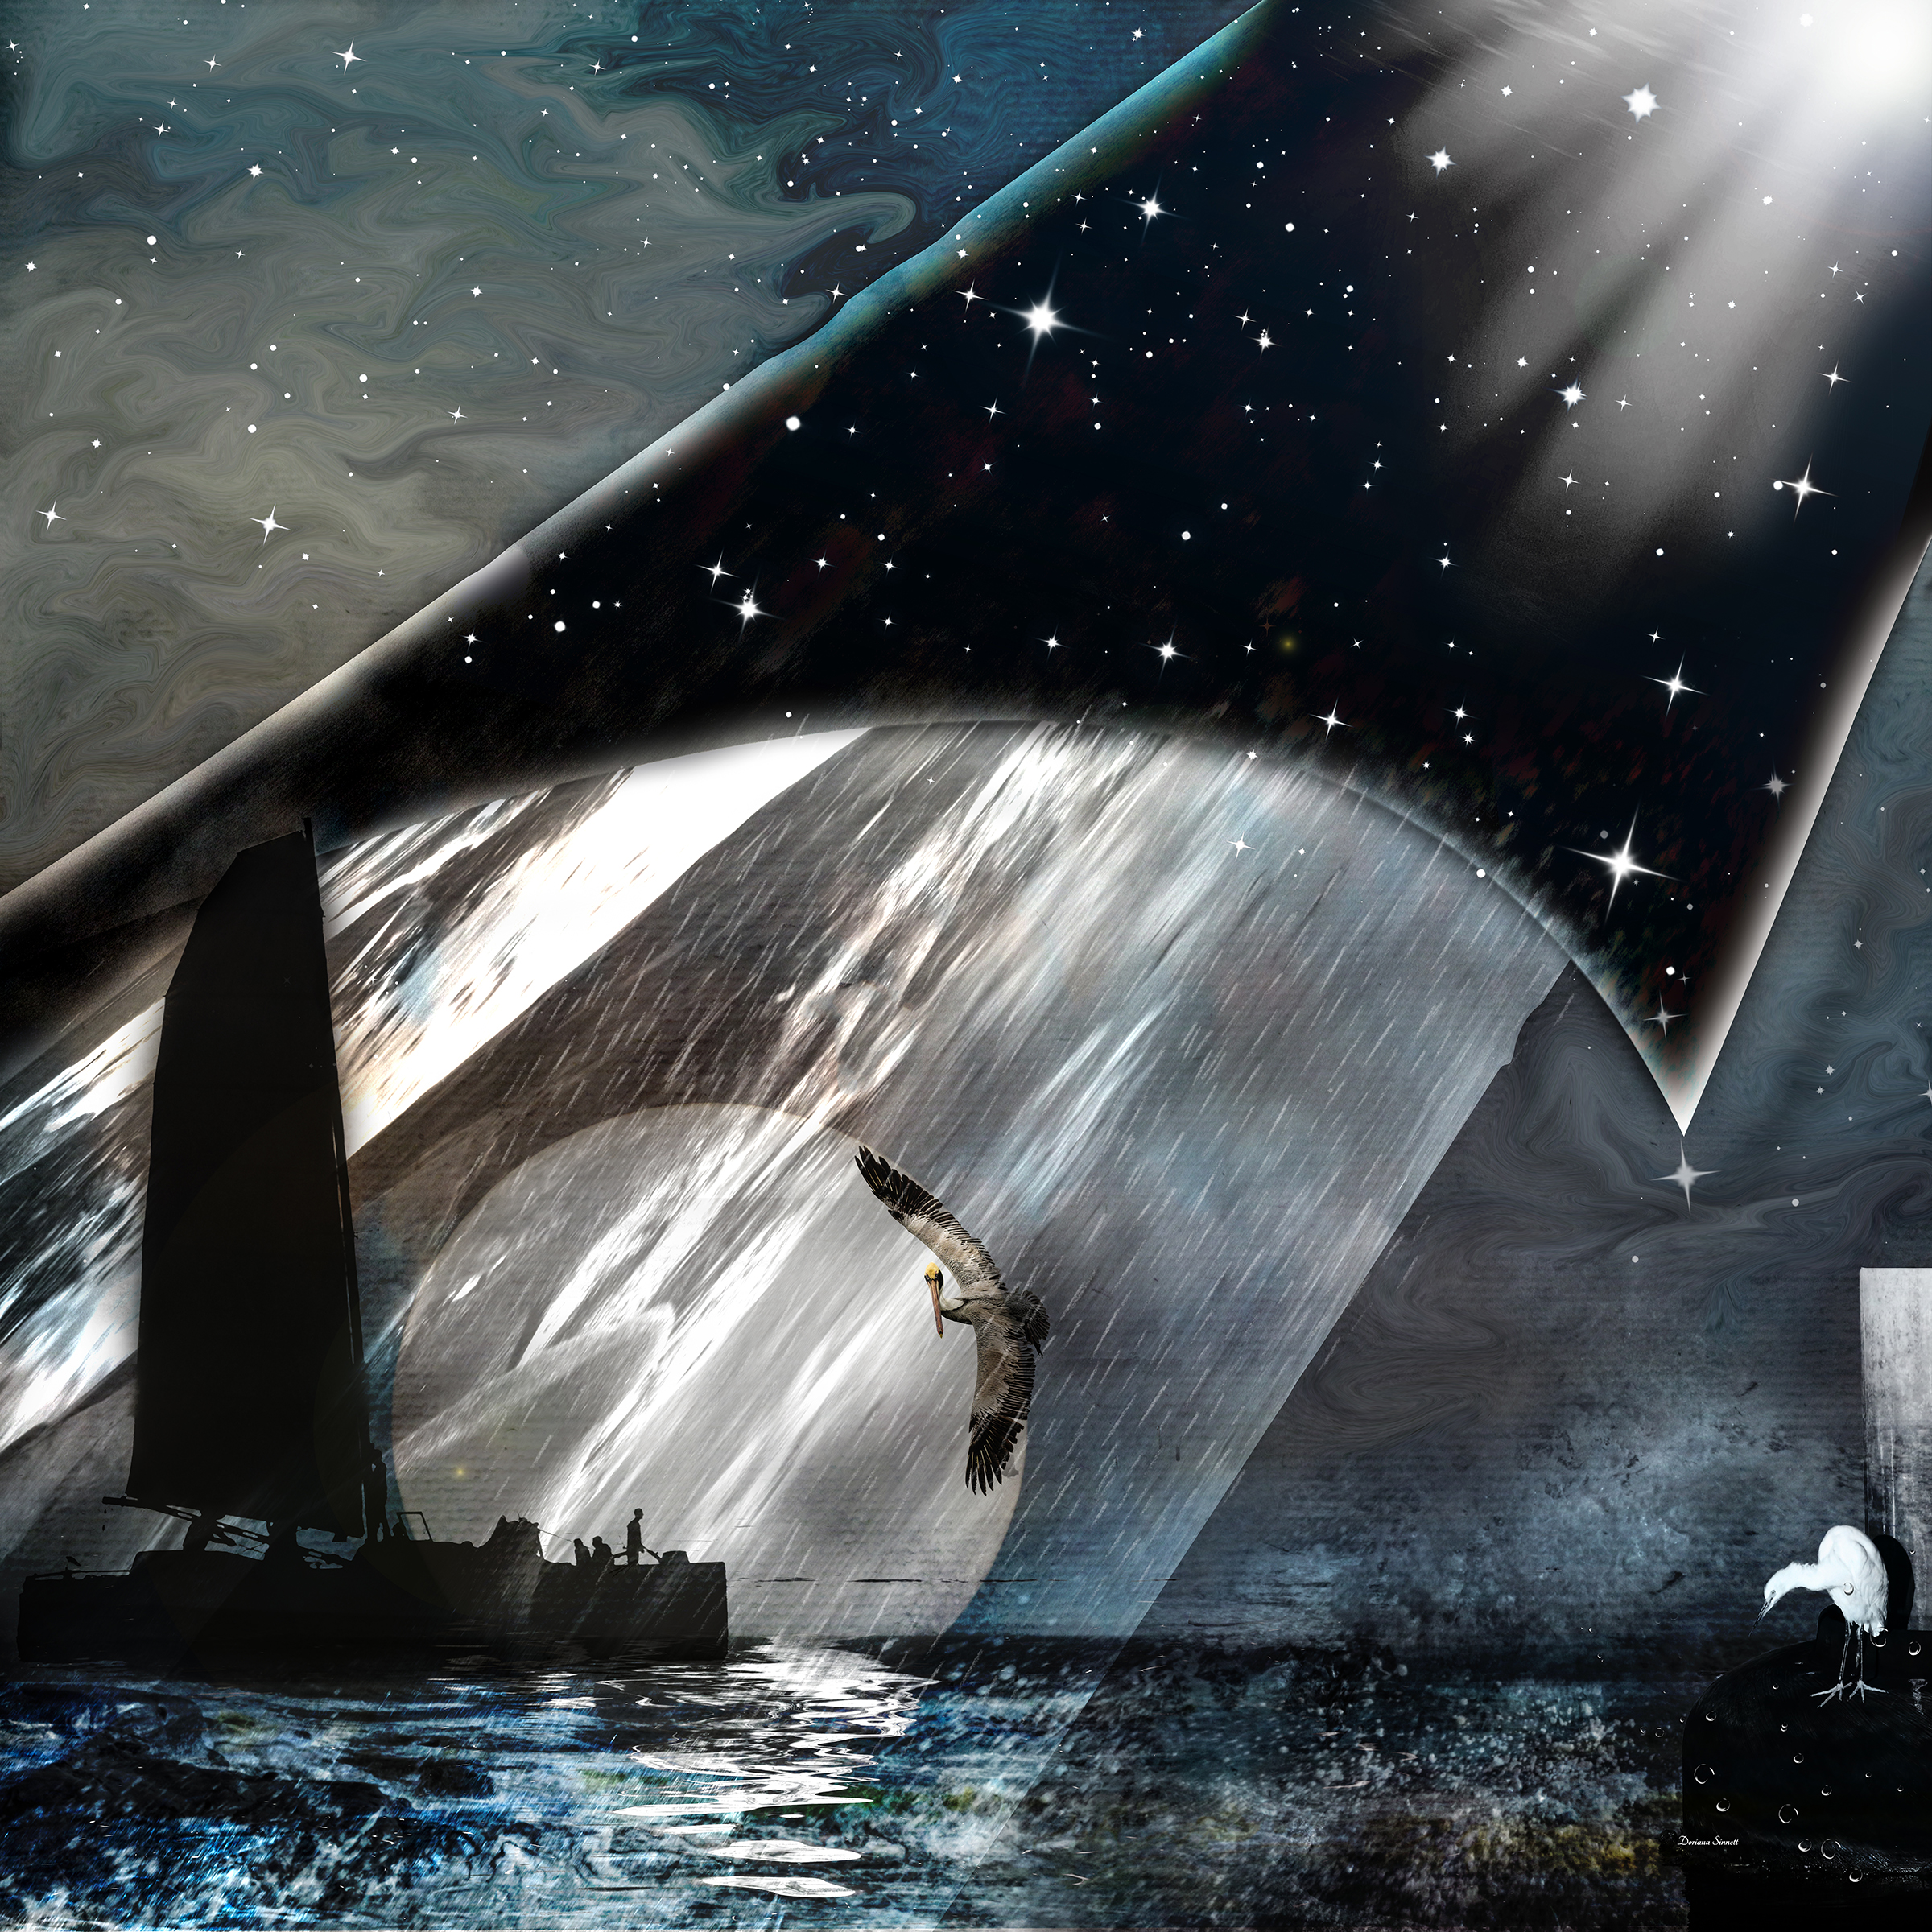 Pelican At Oceanside Harbor…BUY  https://artboja.com/art/38vvy2/22058.php